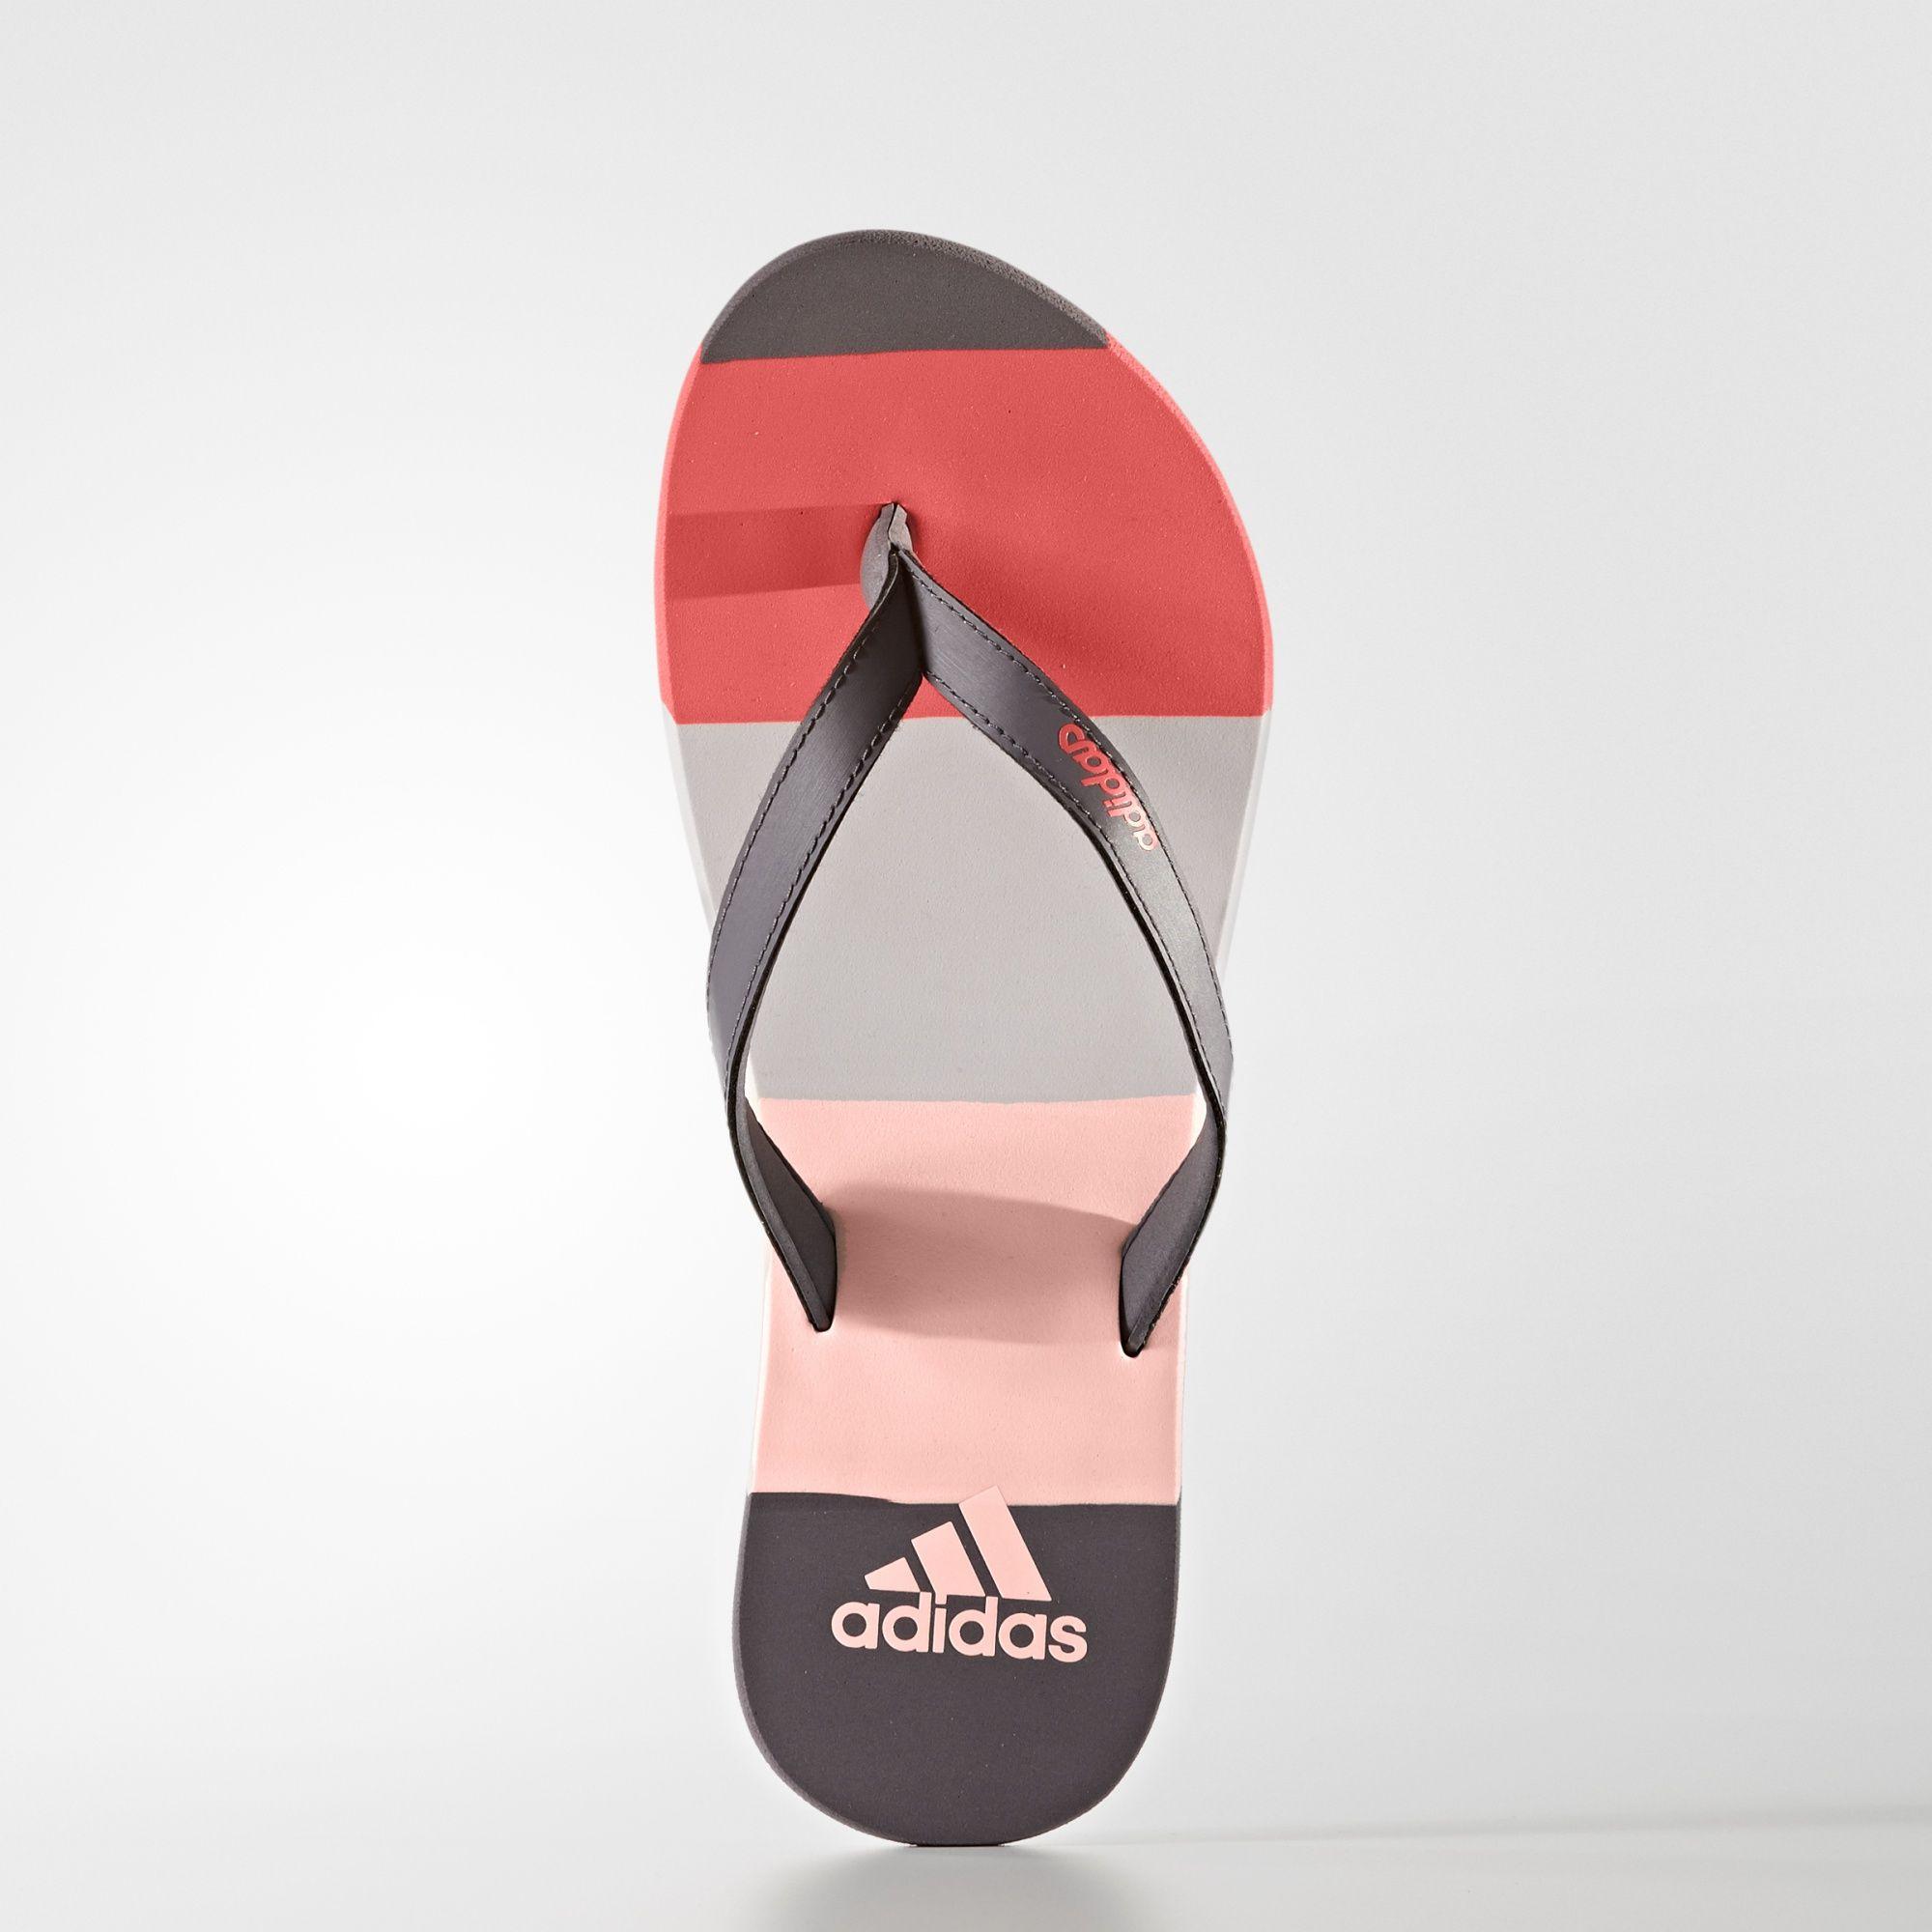 Slapi adidas roz cu gri adidas Eezay Striped Thong S80425 femei